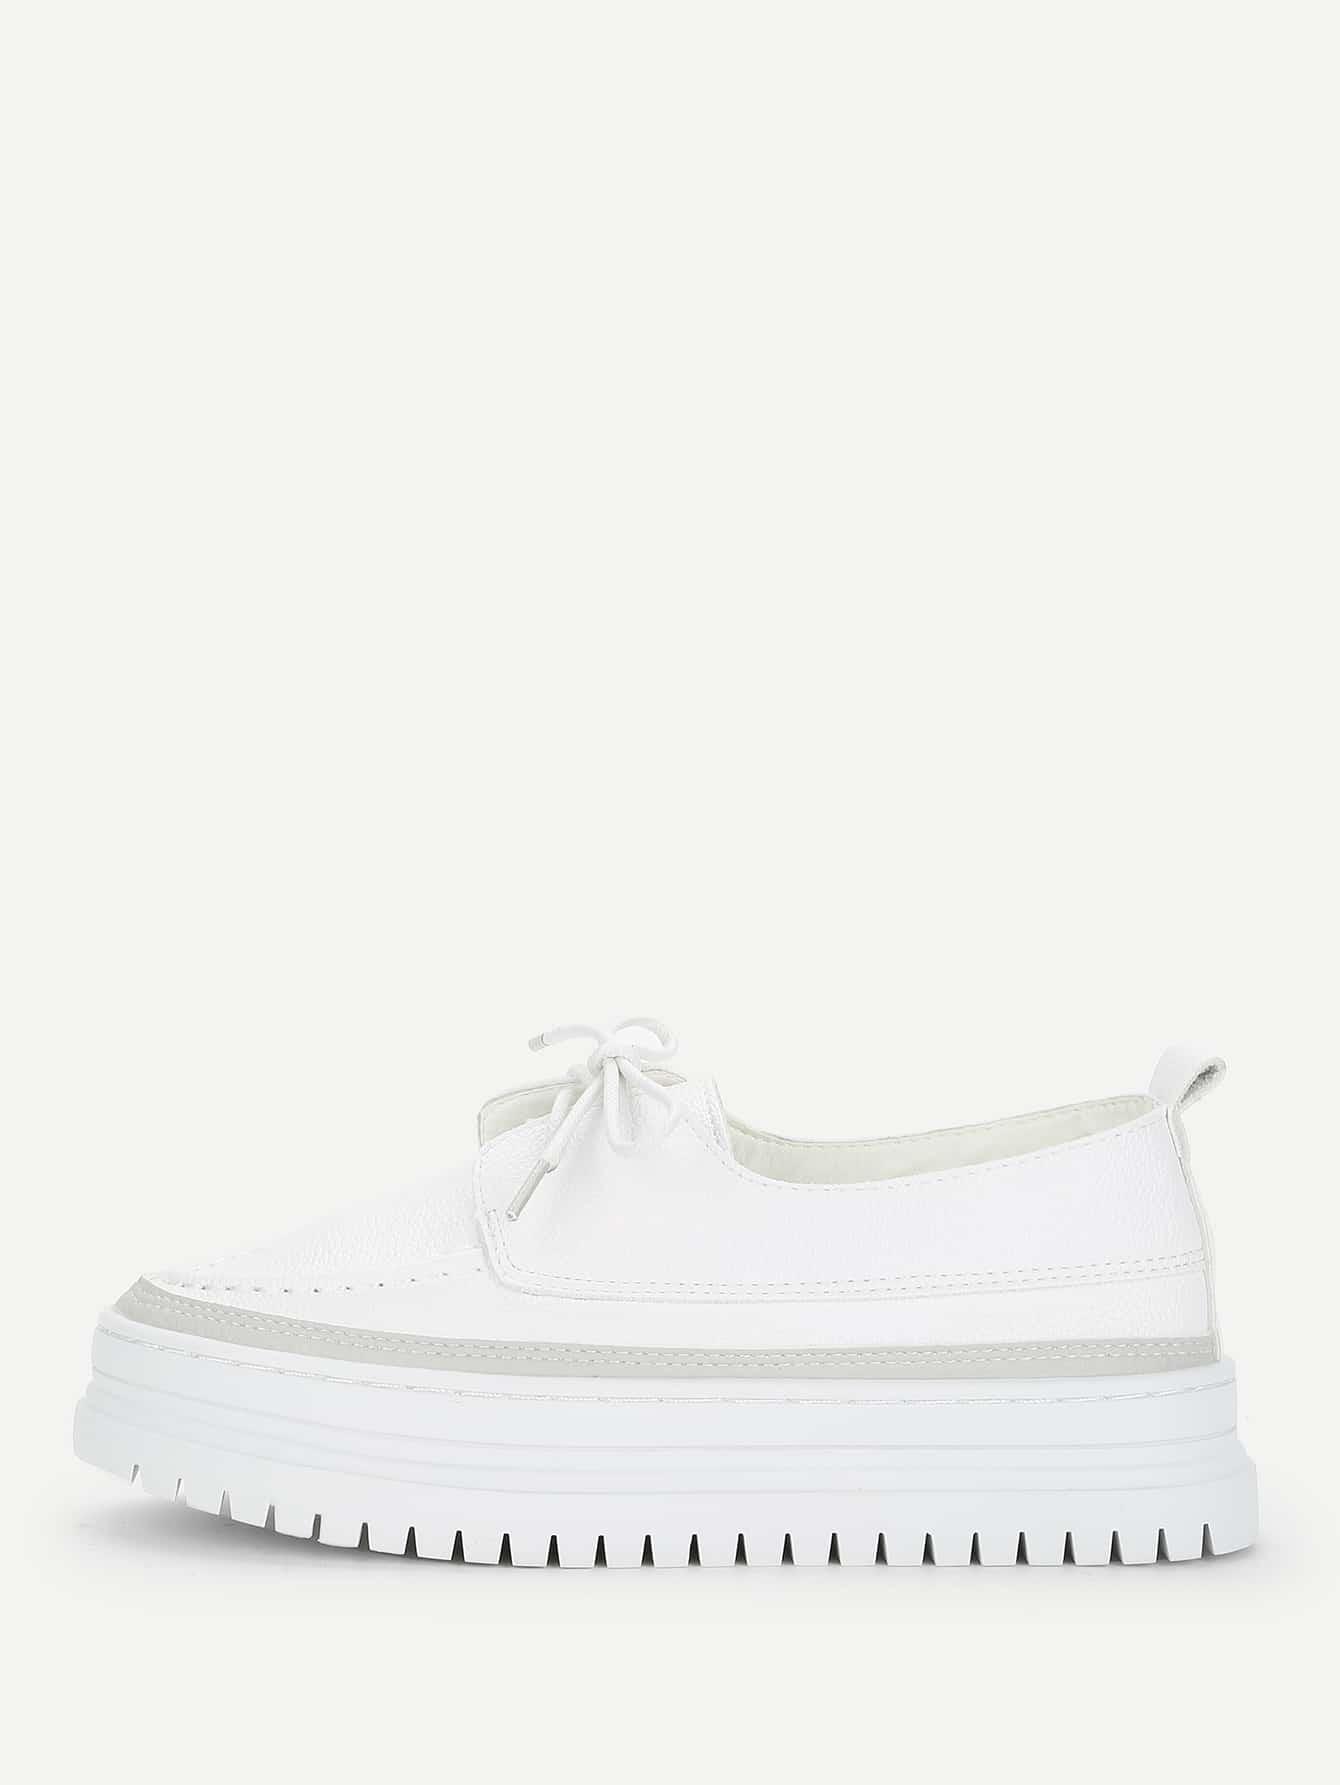 Flatform Lace Up Shoes lace up flatform satin shoes